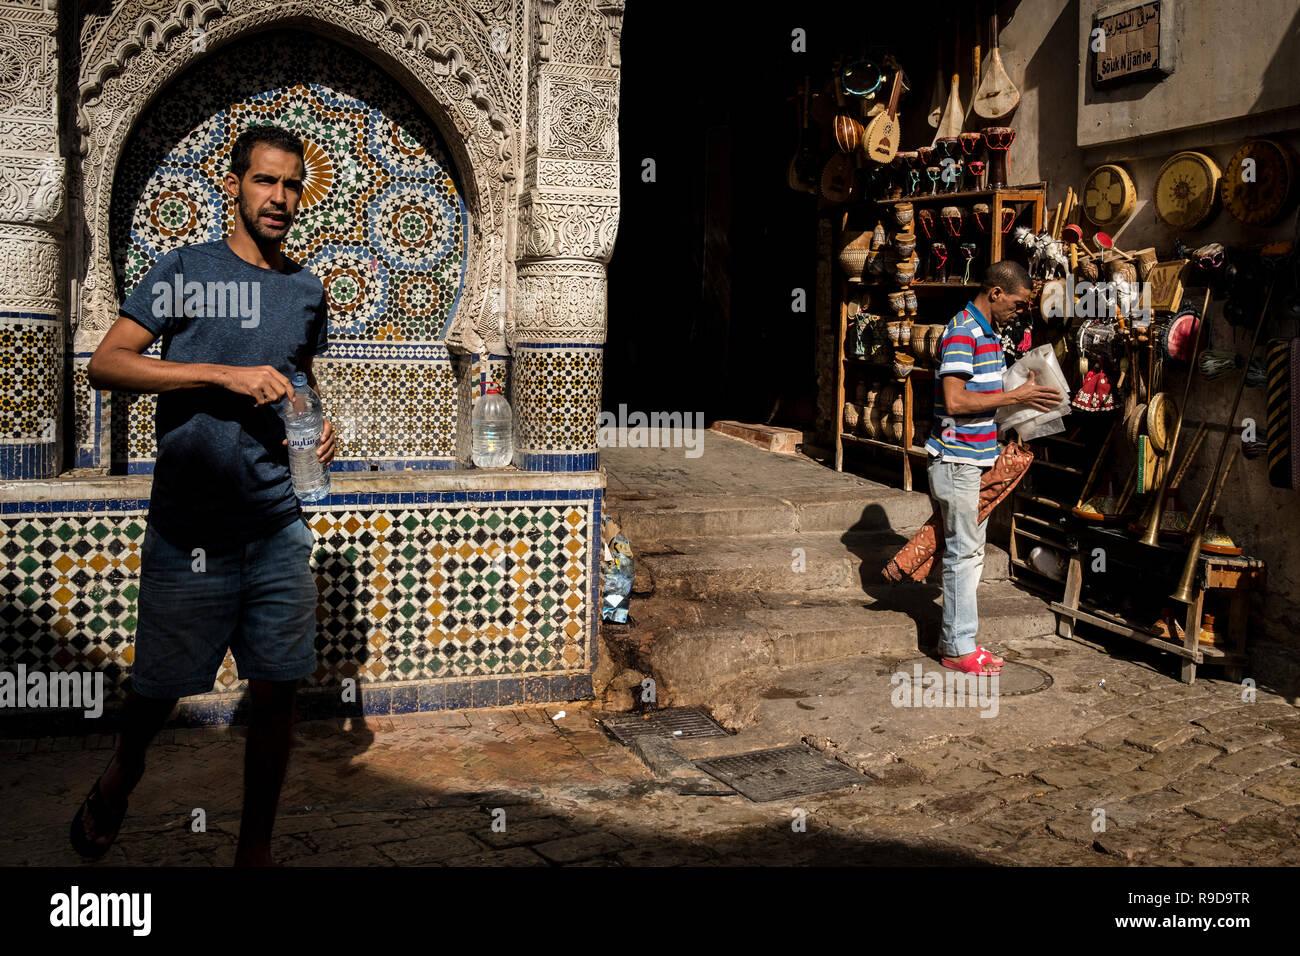 Fes, Morocco - 20 September 2017: Souk Njjarine square - Stock Image